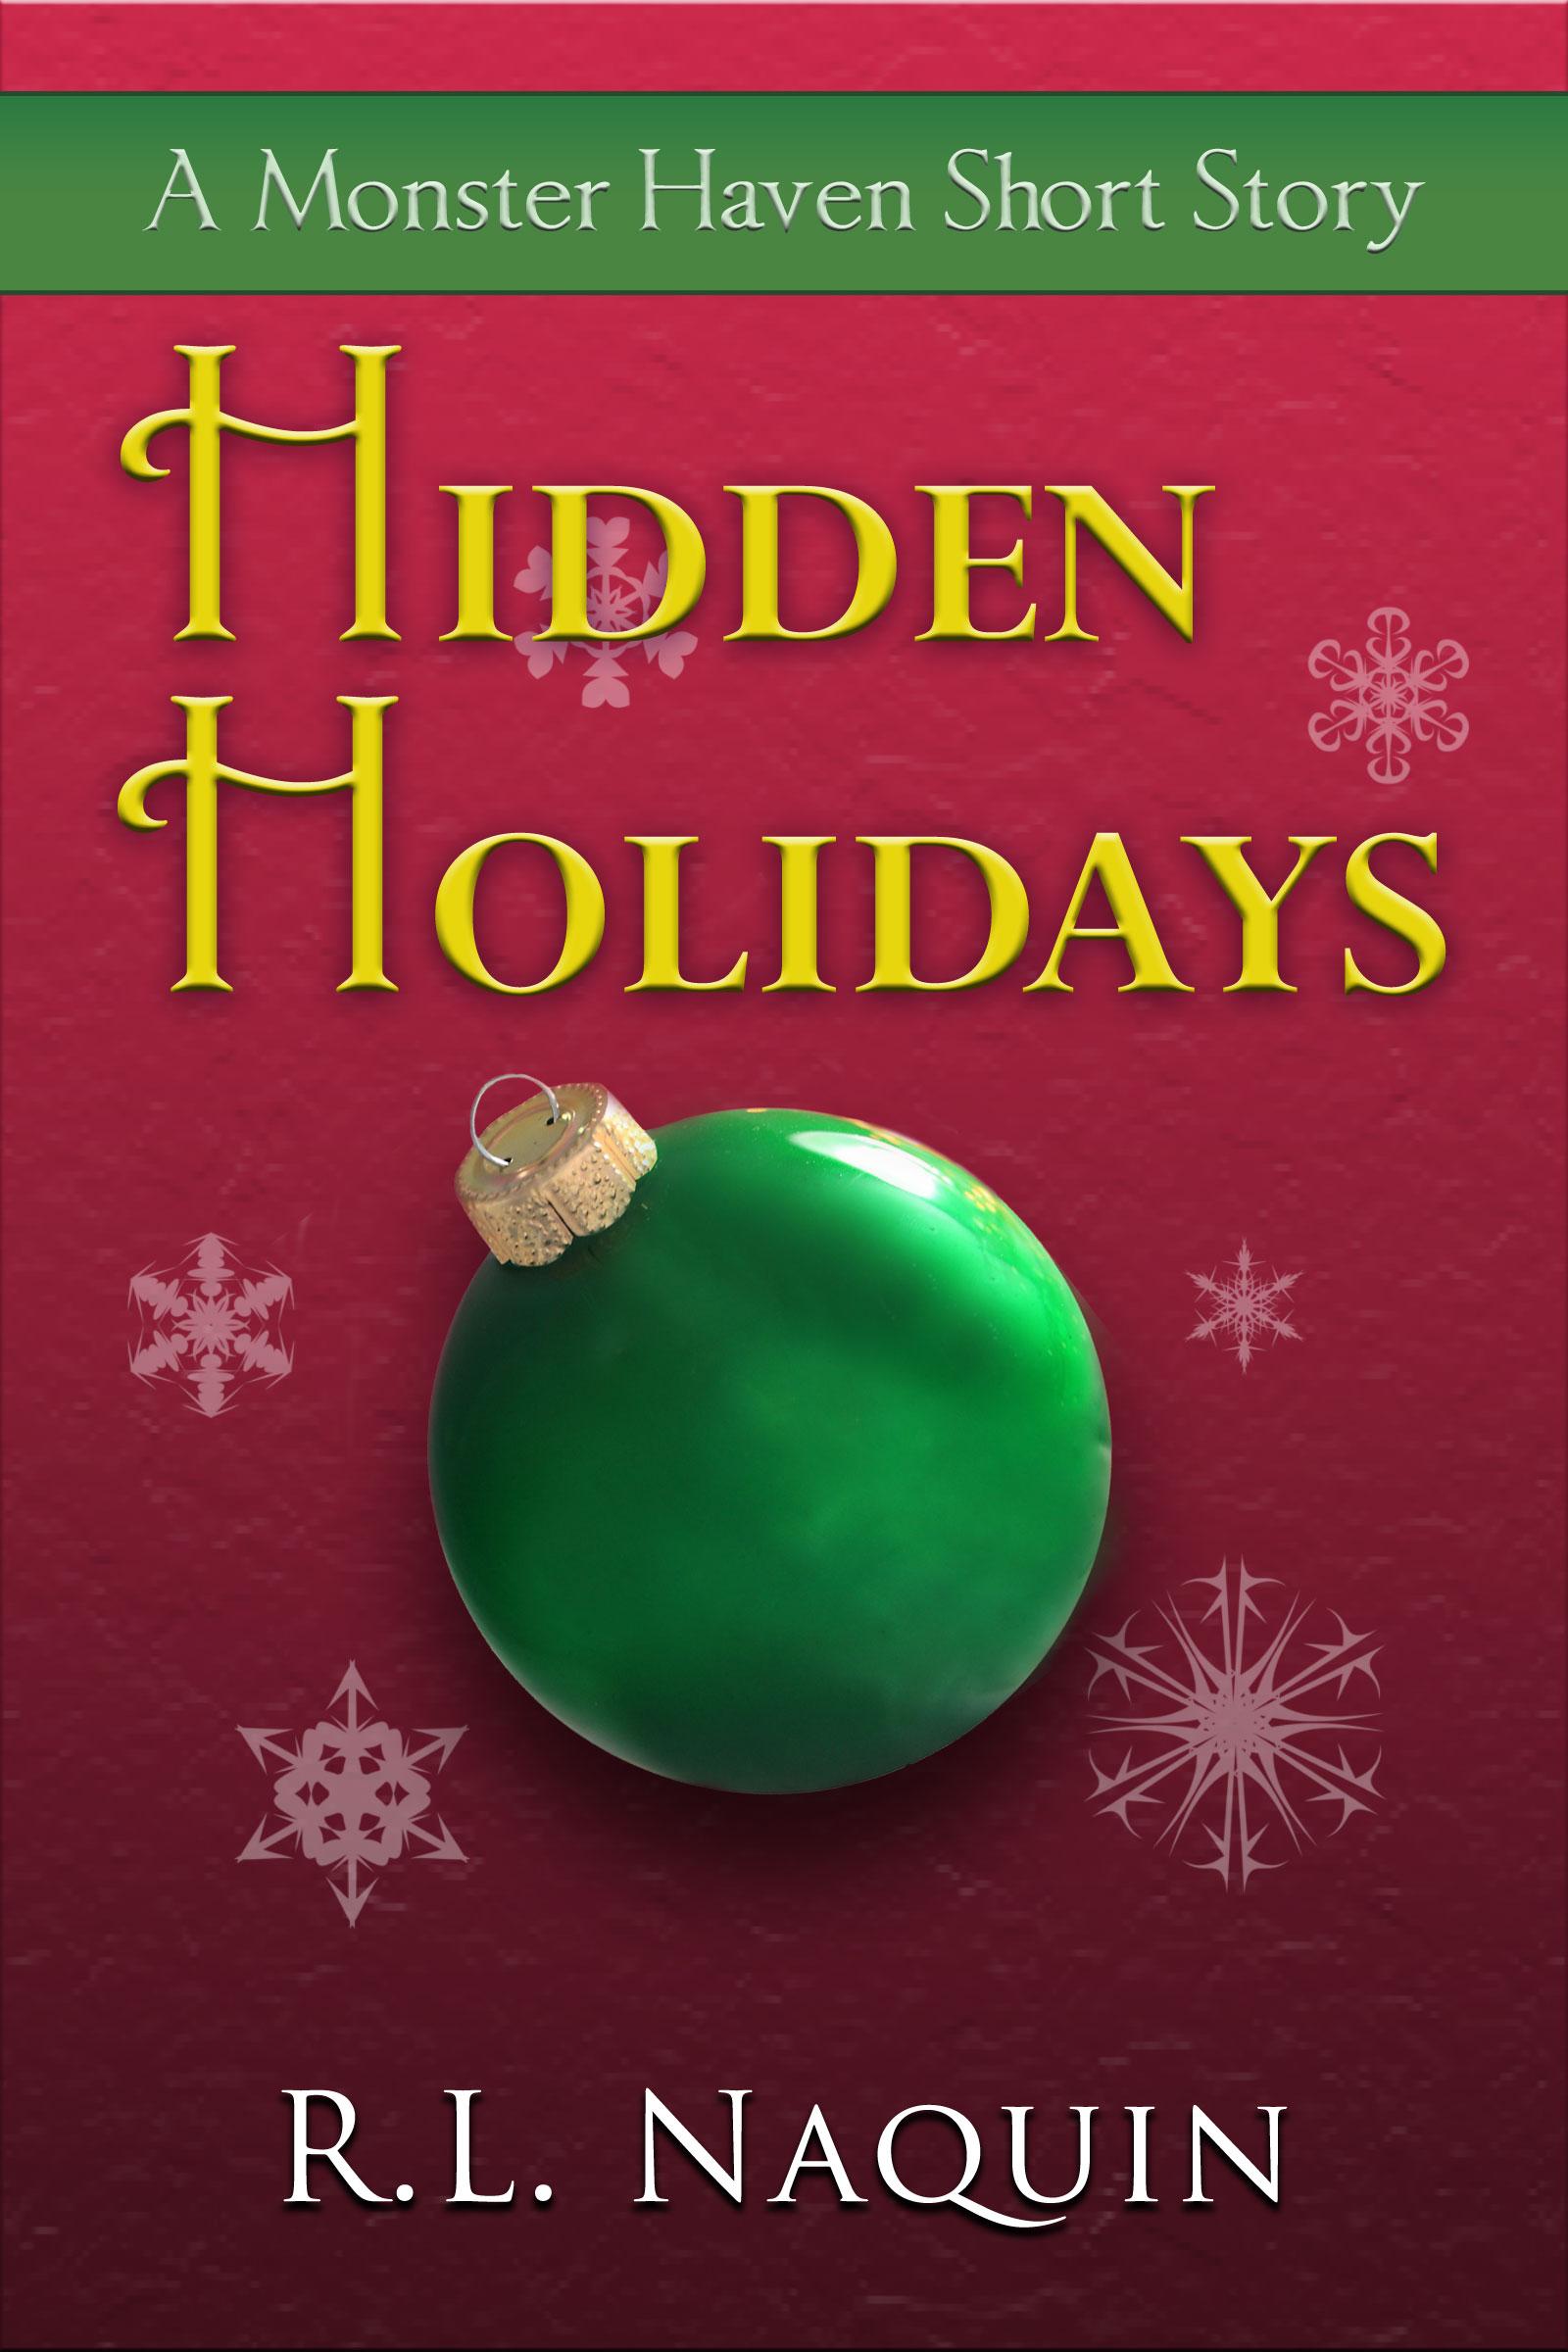 hidden holidays